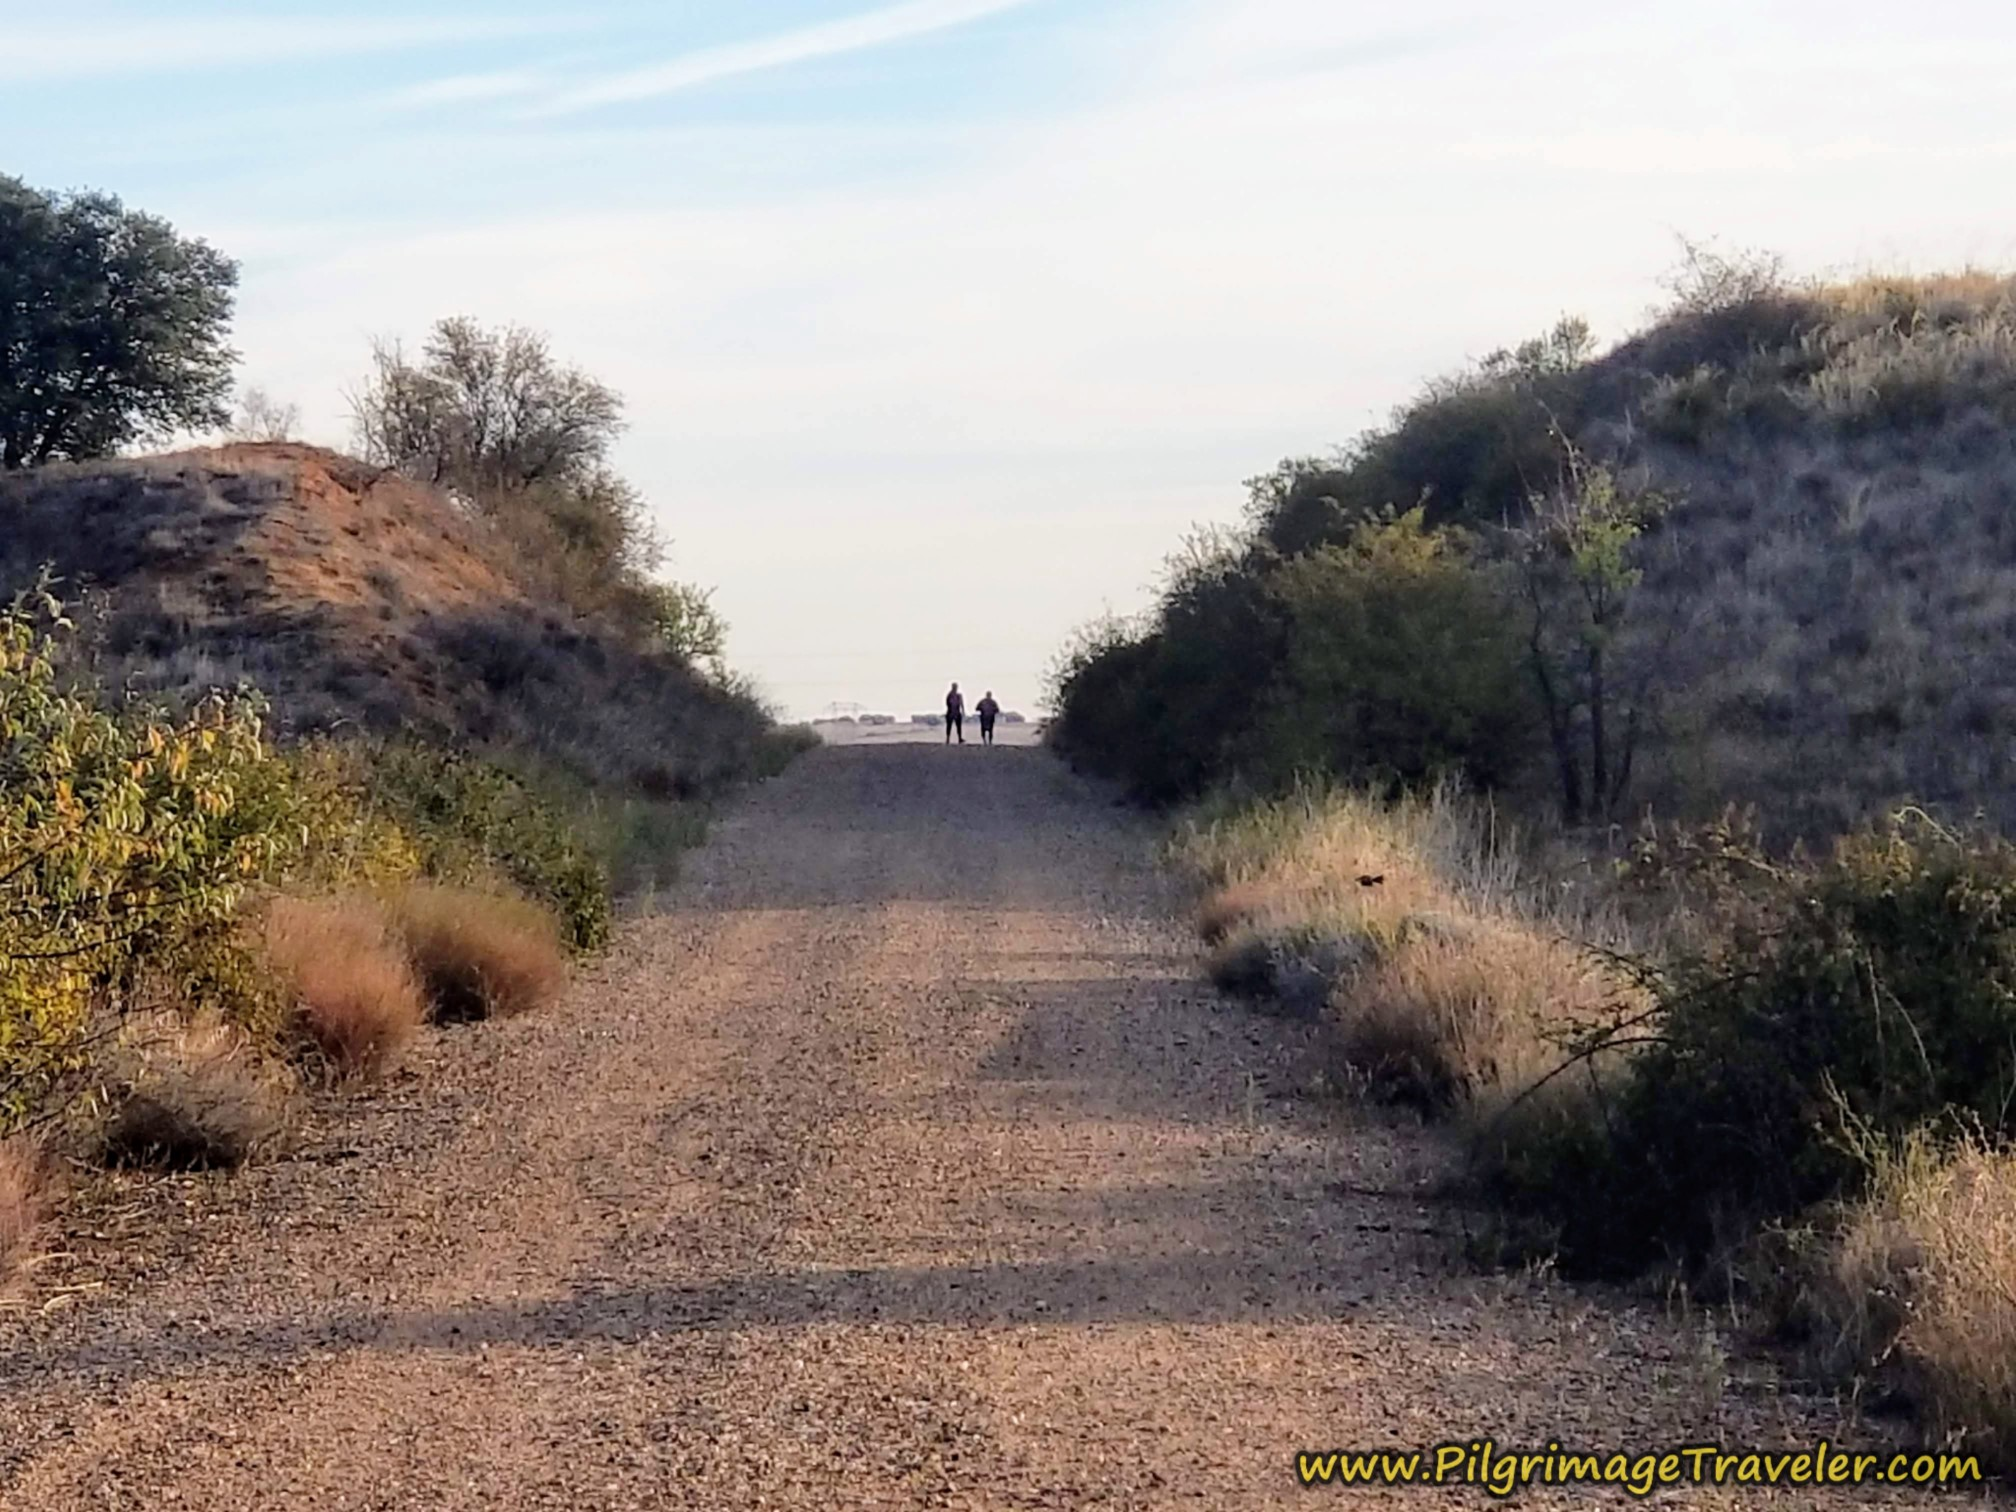 Short Detour from Highway